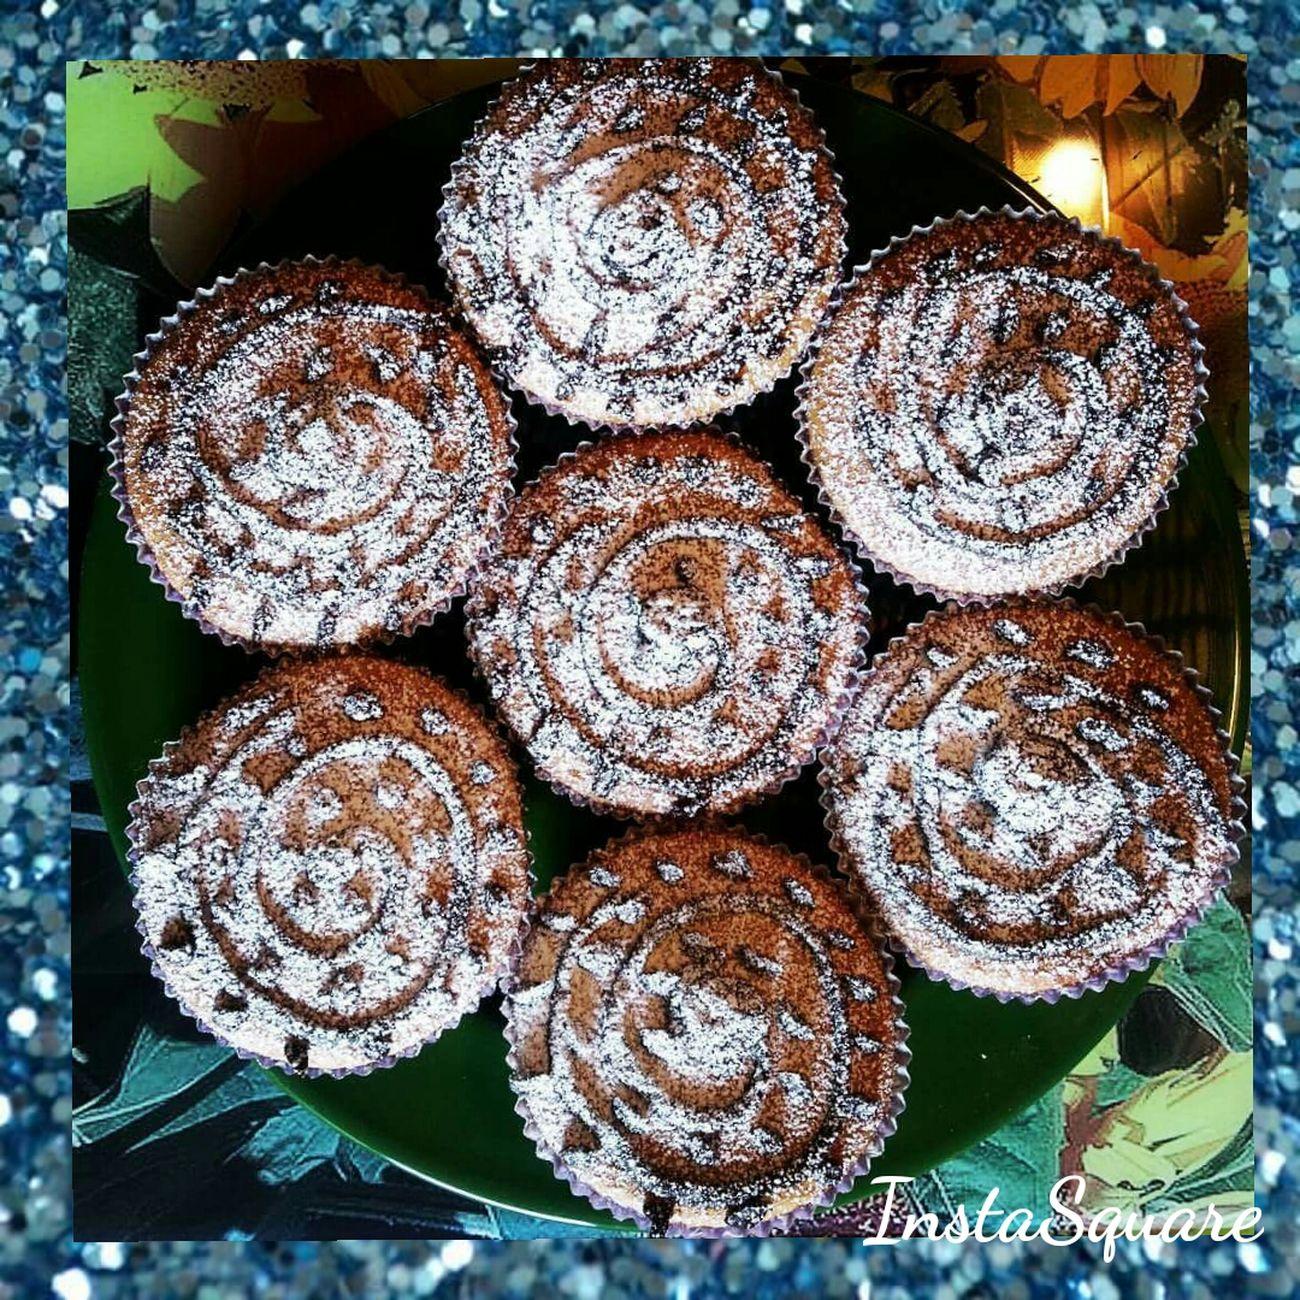 🤗☕🍰 Coffee Time Weekend Bakery Cake I❤cakes Bakery LittlePieceOfHeaven Coffee ☕ Littlecake Bakerylove Handmade Handmade By Me Bakery Freaks Yummy♡ Yummy Food Yummyinmytummy Yummylicious Yummyness Muffins Backen Muffinsundso Muffins 4 Love